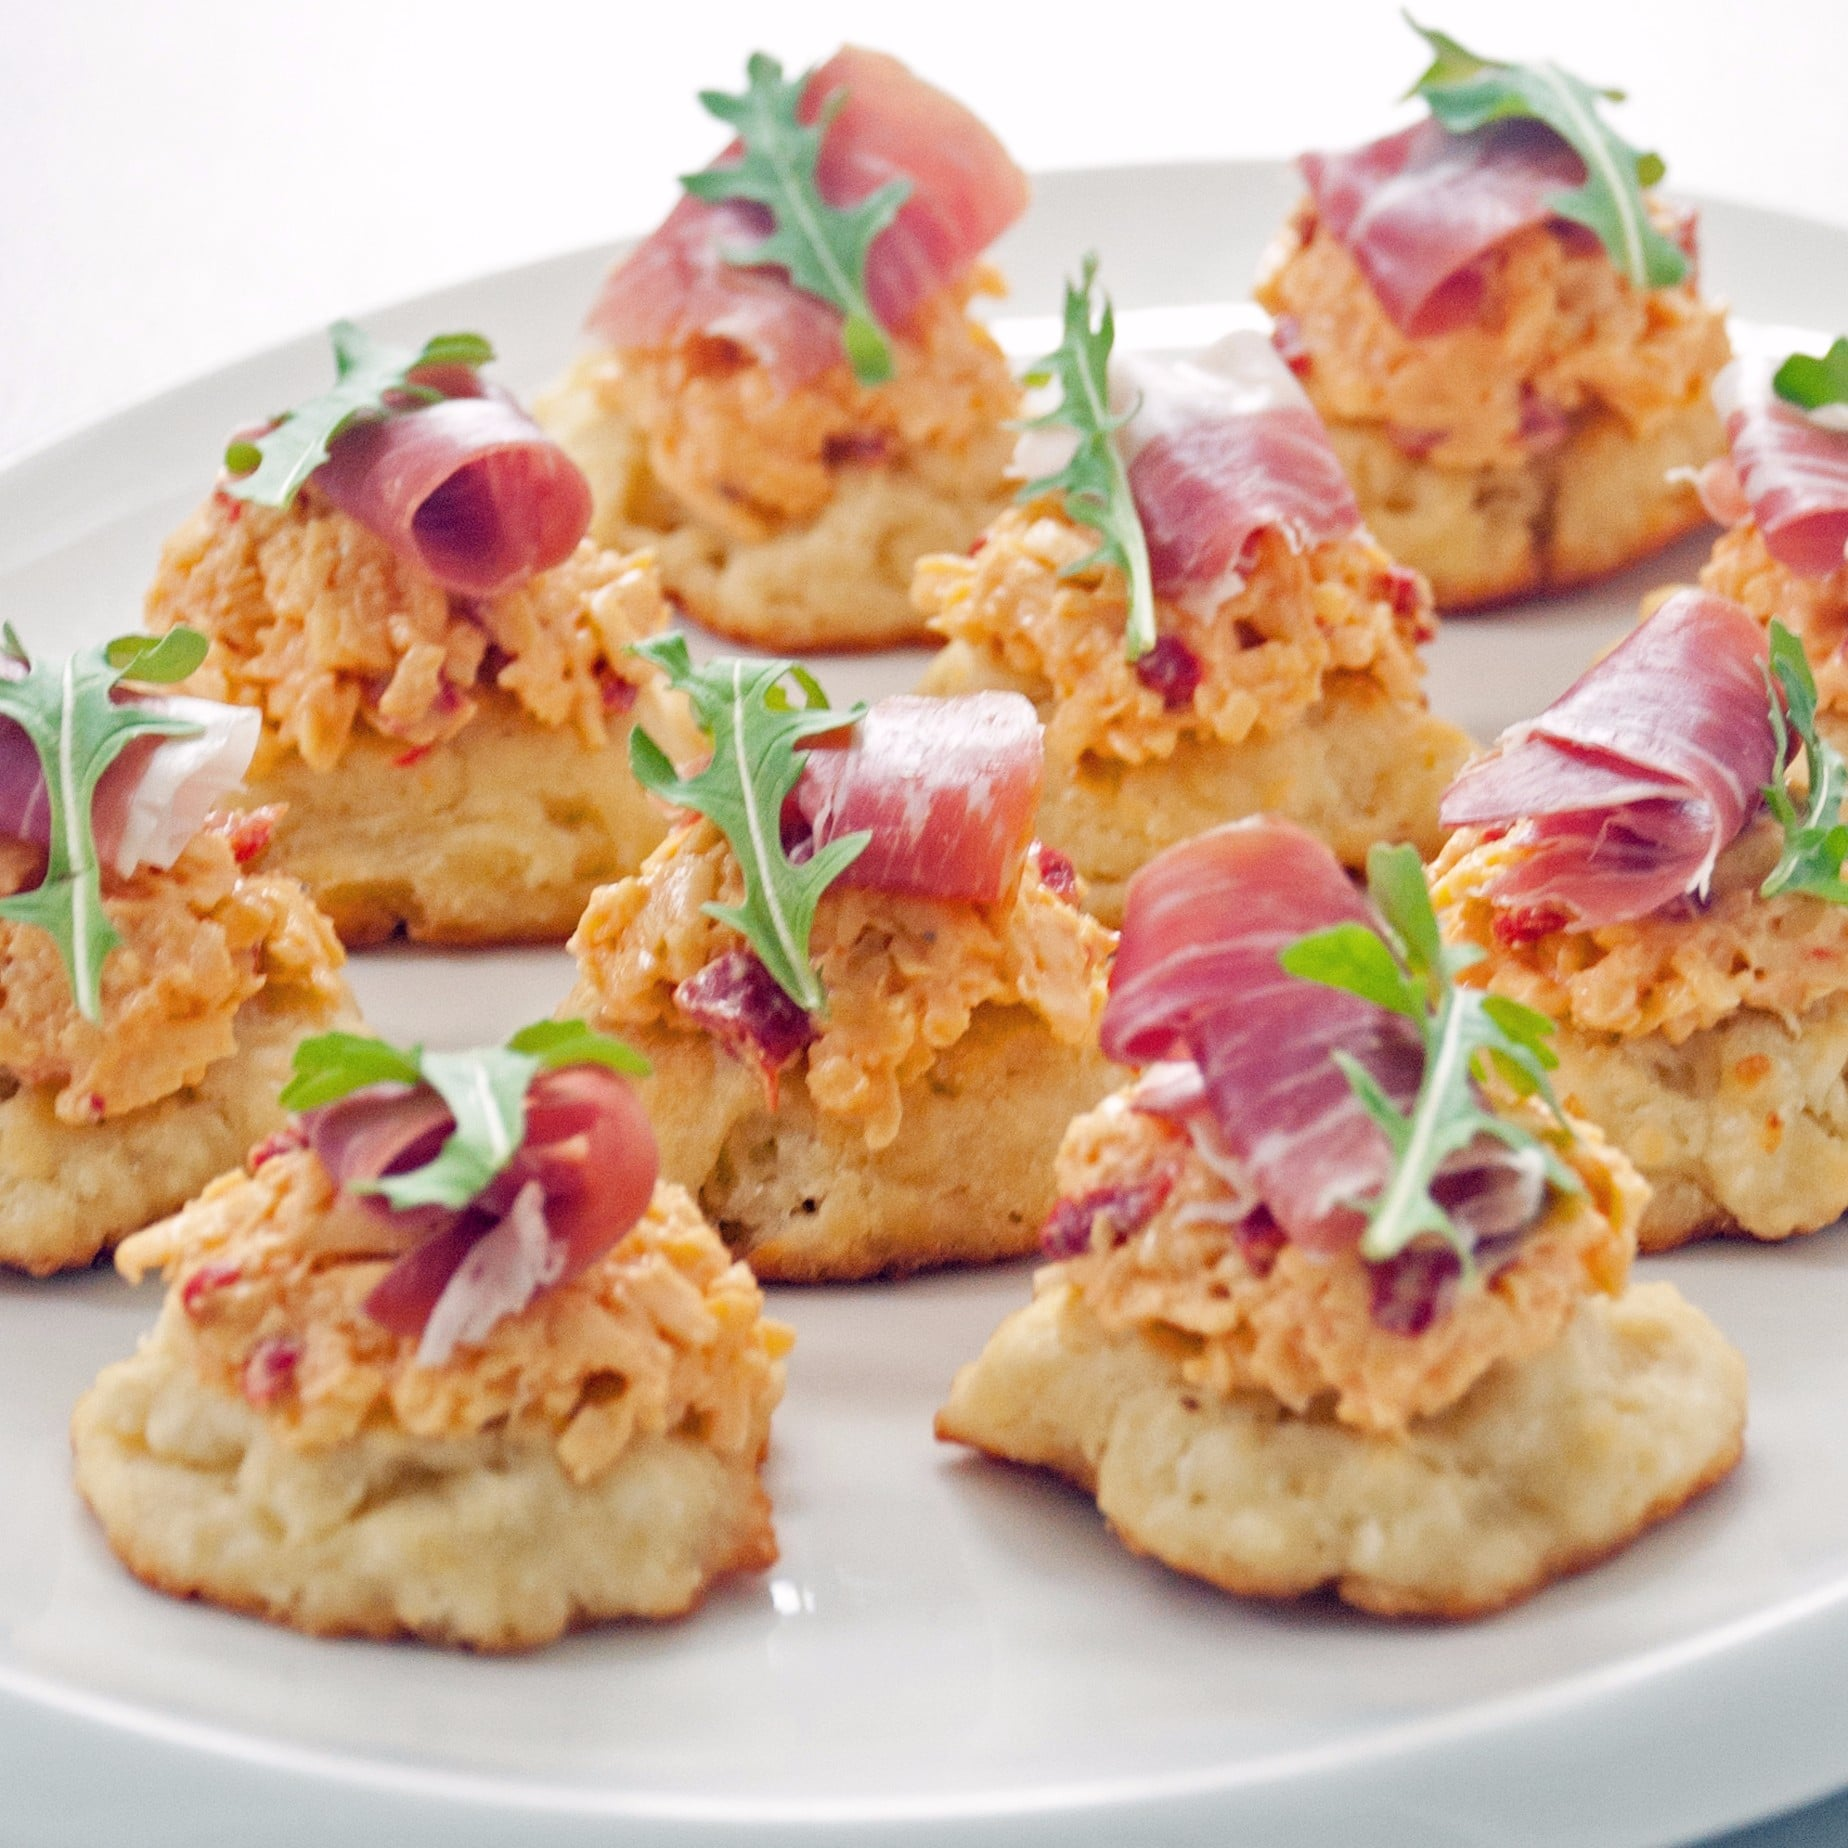 Wedding appetizer ideas popsugar food solutioingenieria Gallery